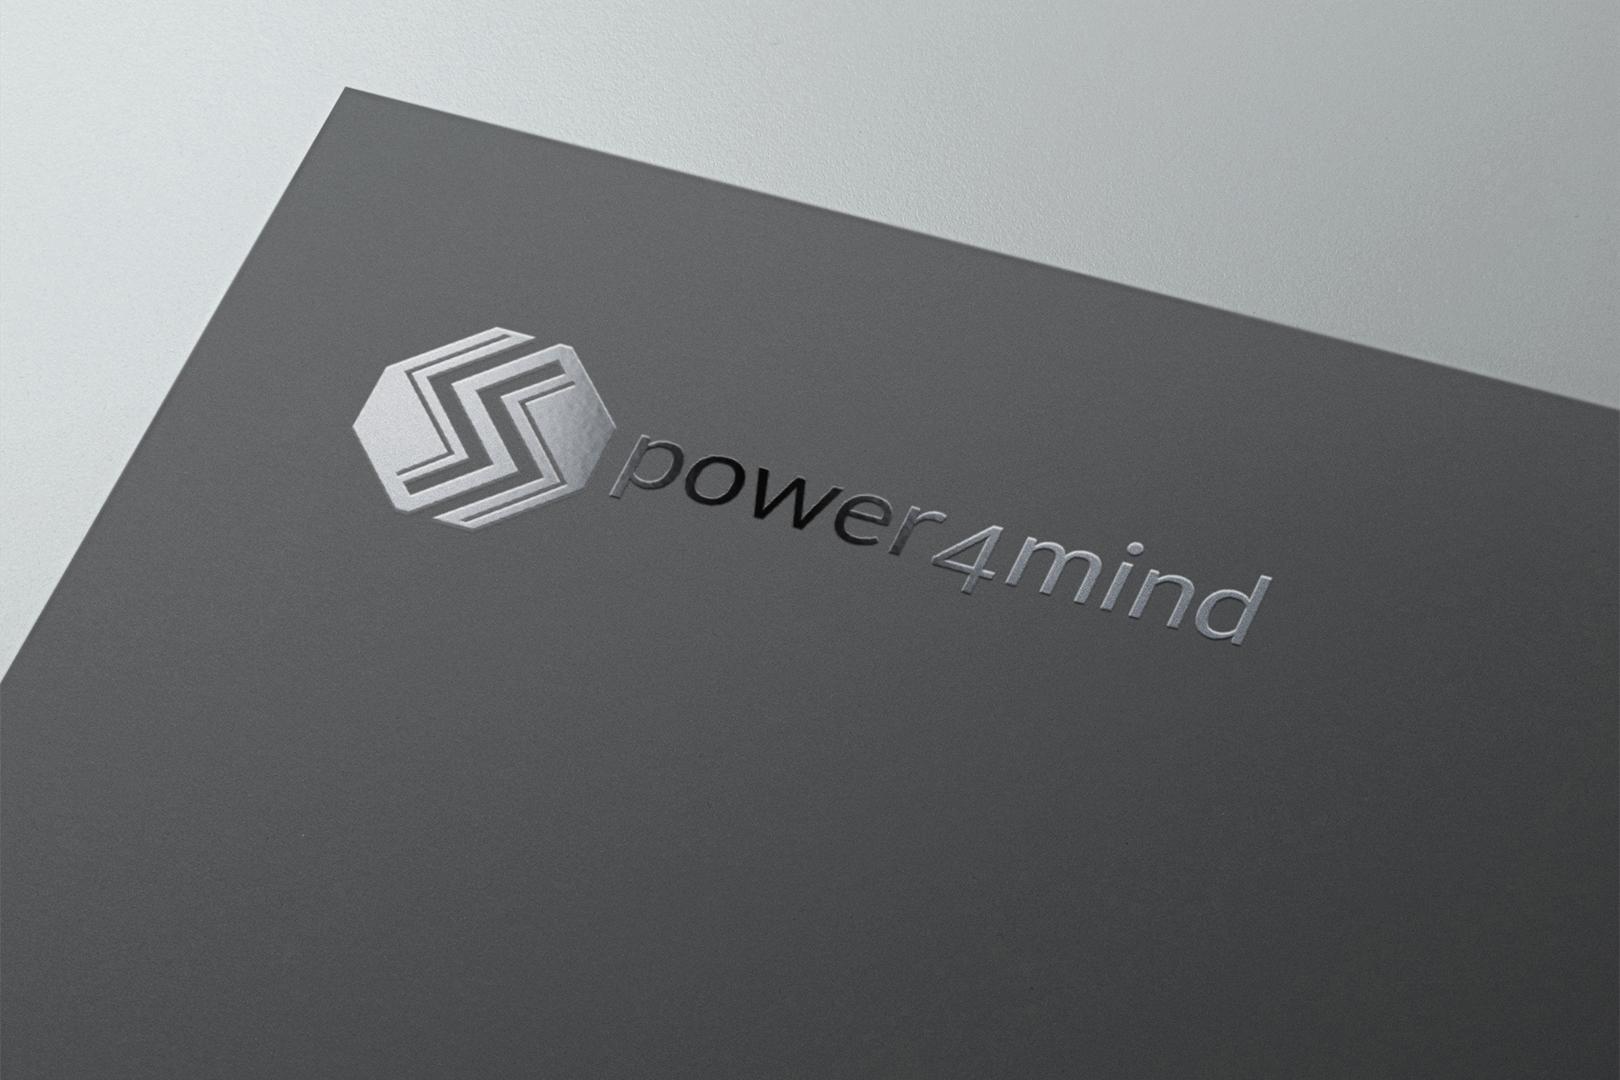 p4m-2-mu